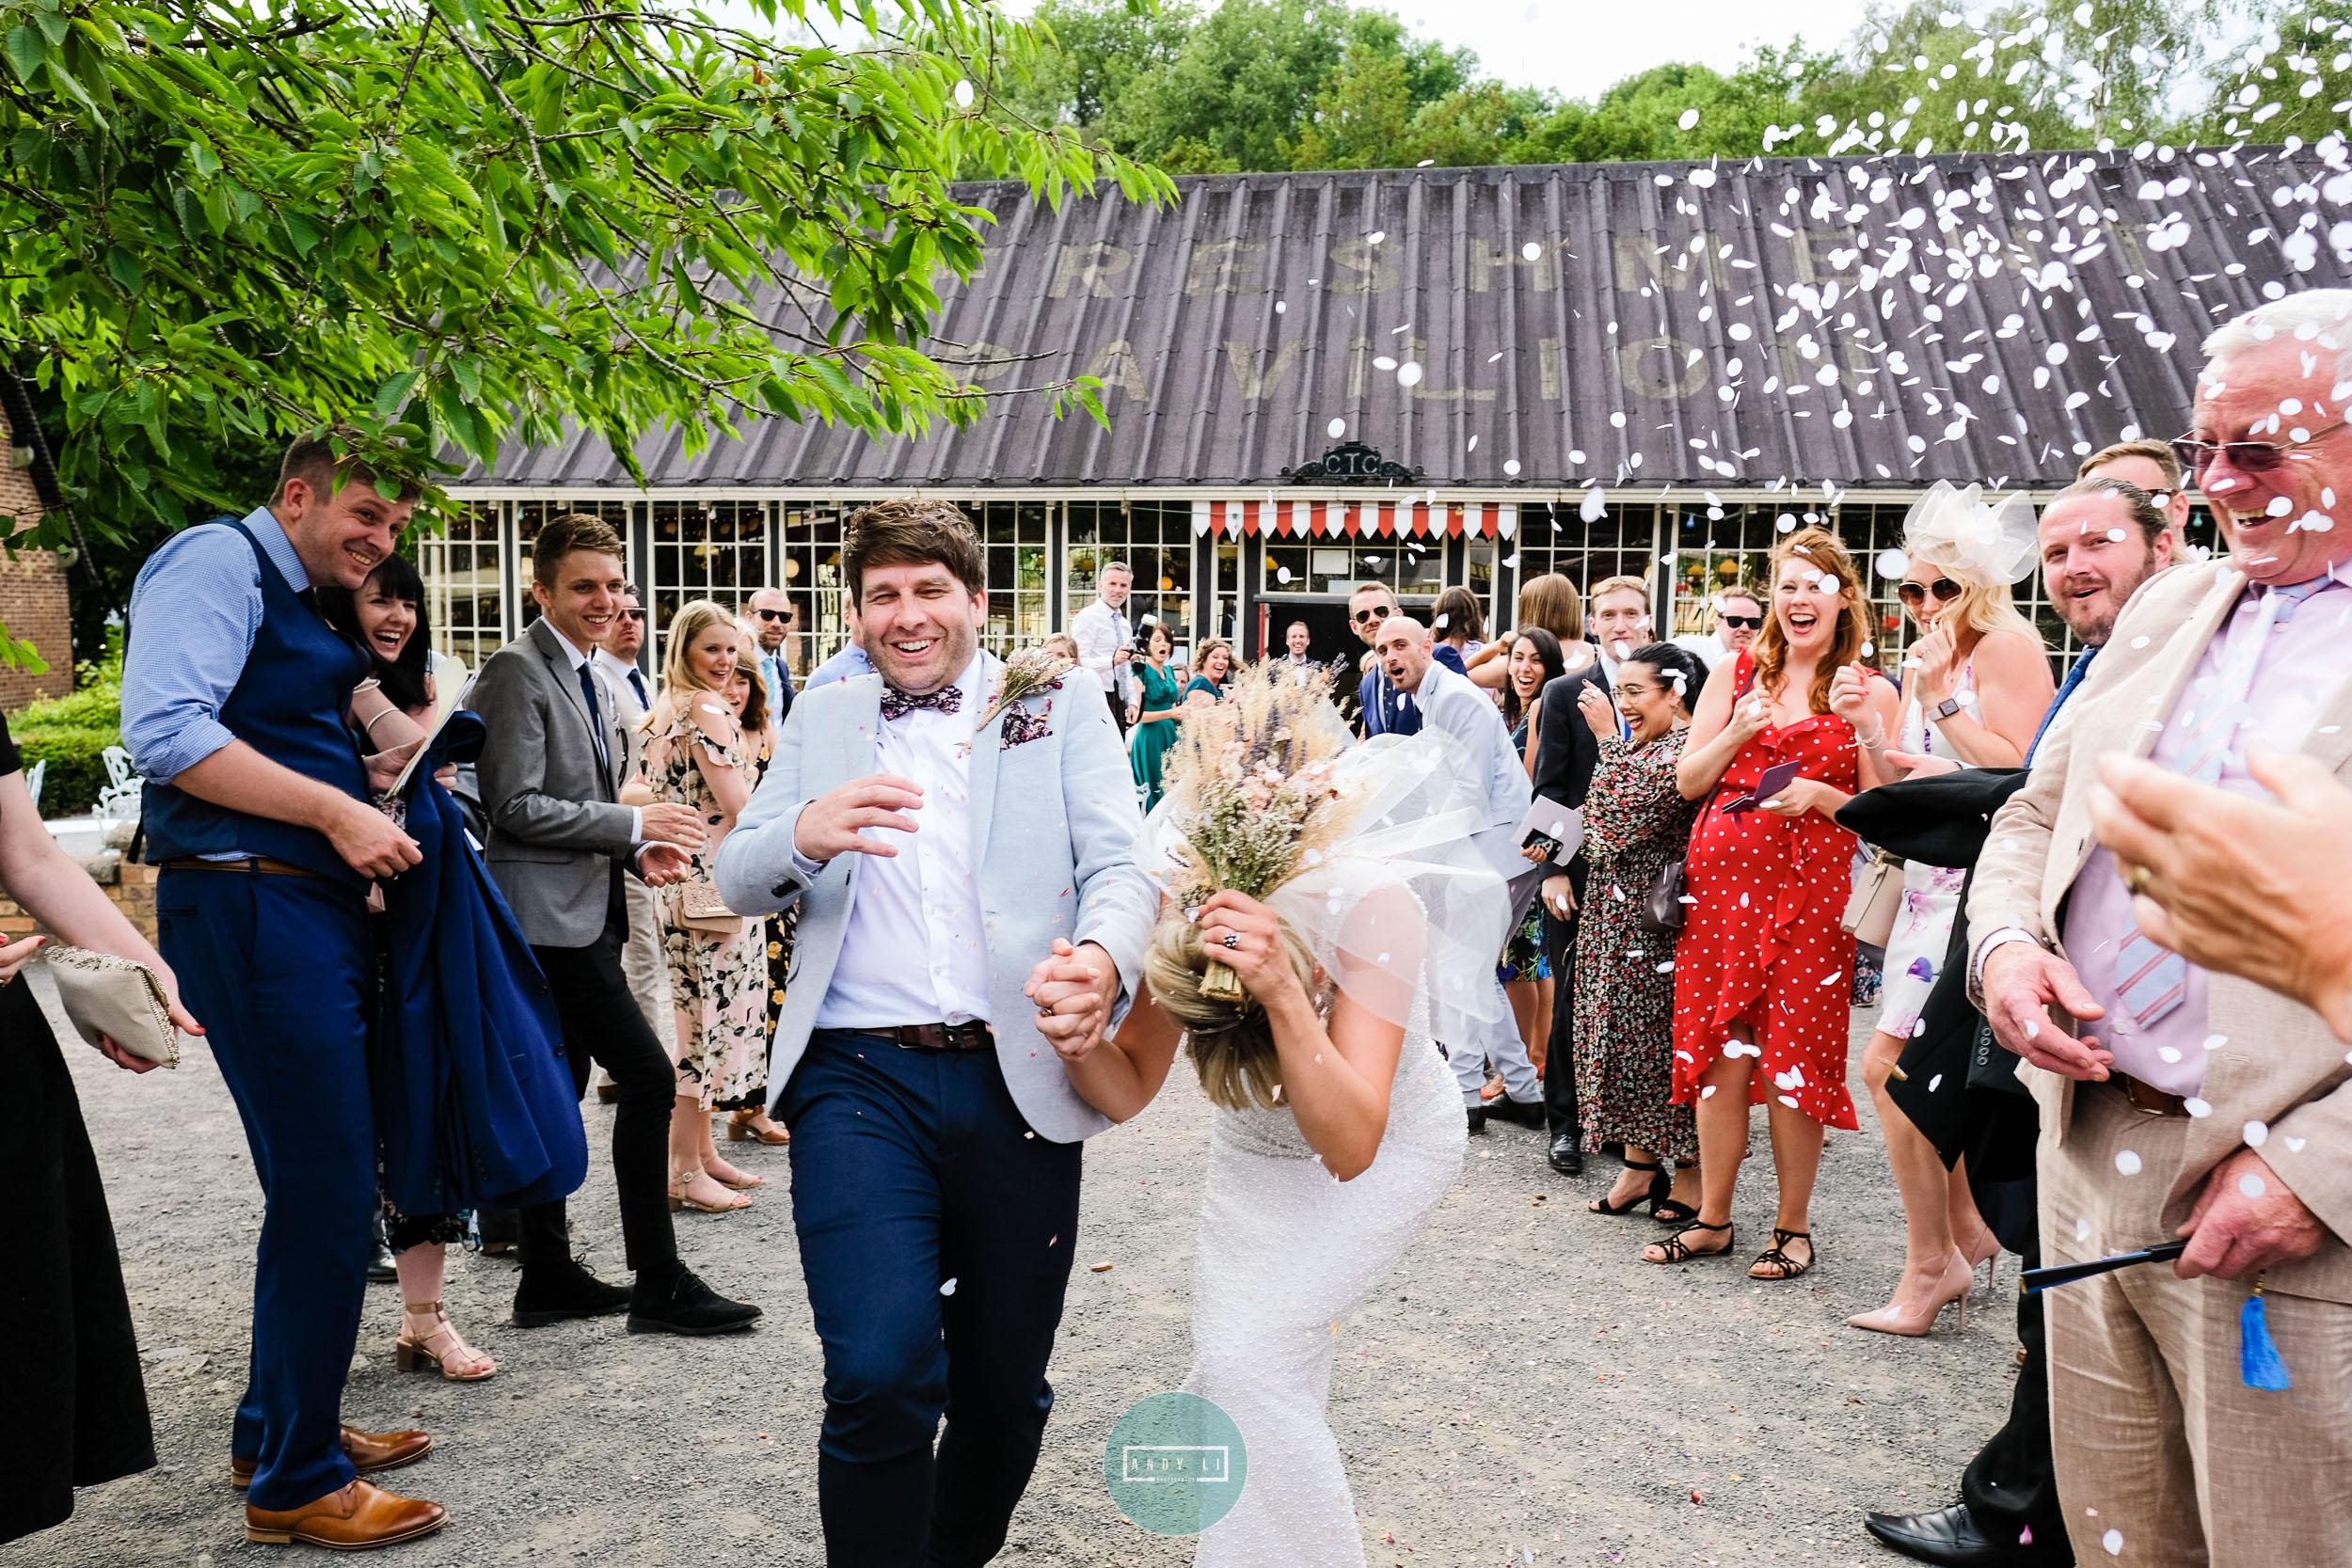 Blists Hill Victorian Town Ironbridge Wedding Photographer-002-XPRO6861.jpg